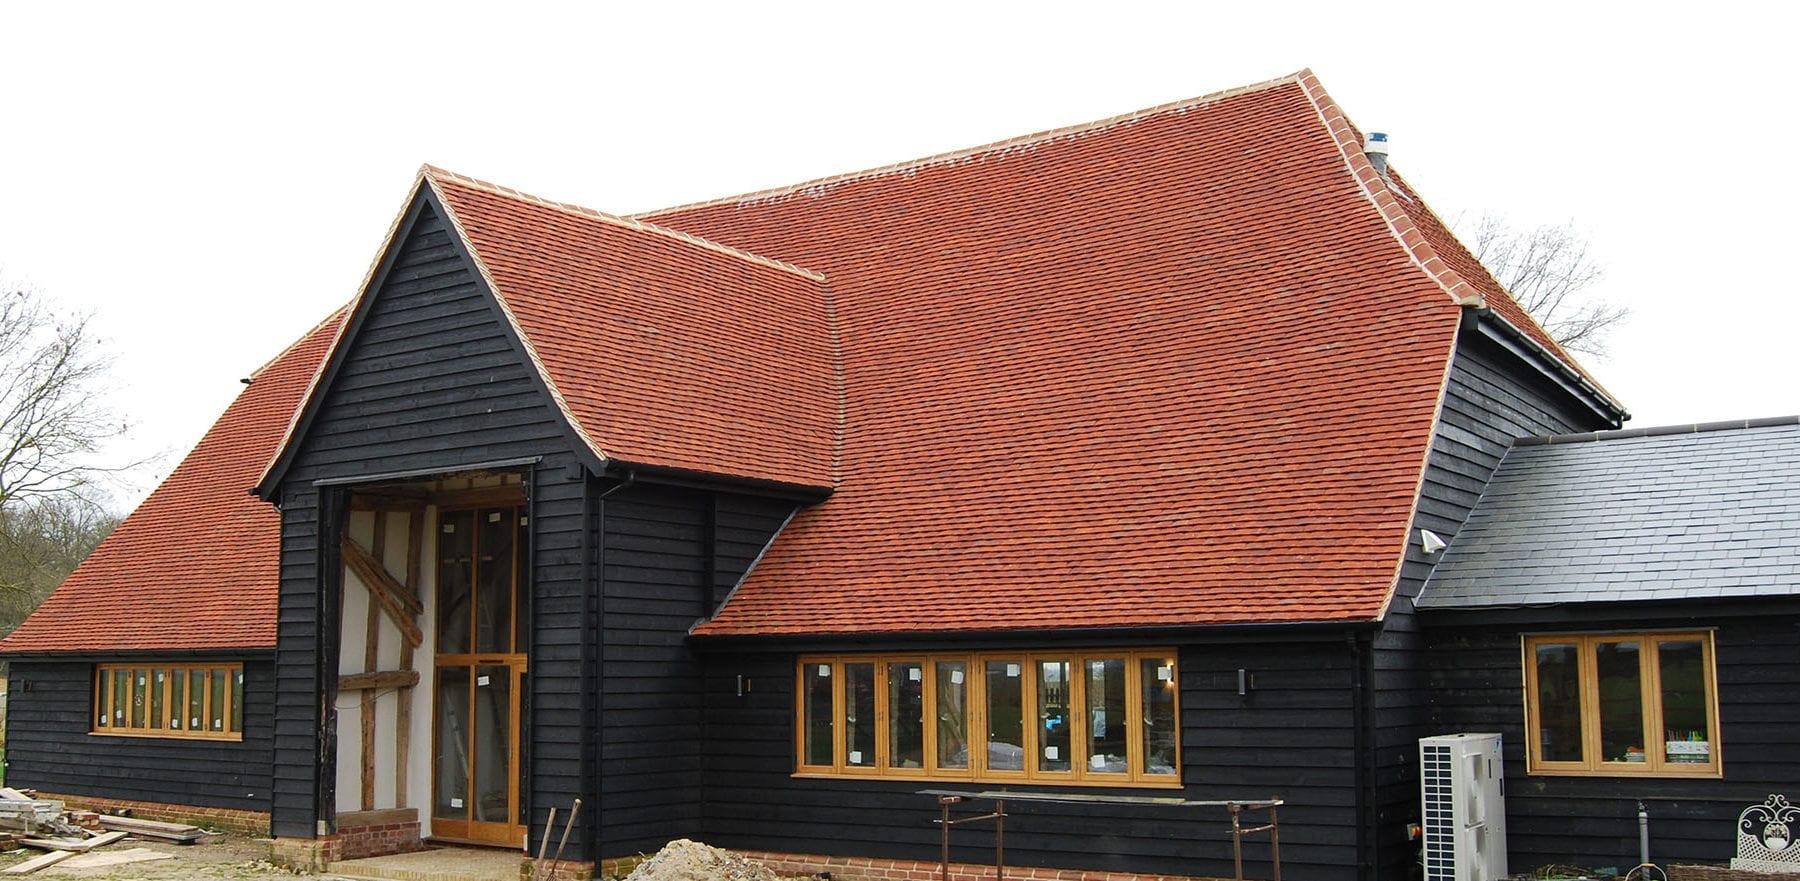 Lifestiles - Handmade Red Clay Roof Tiles - Guestingthorpe, England 2